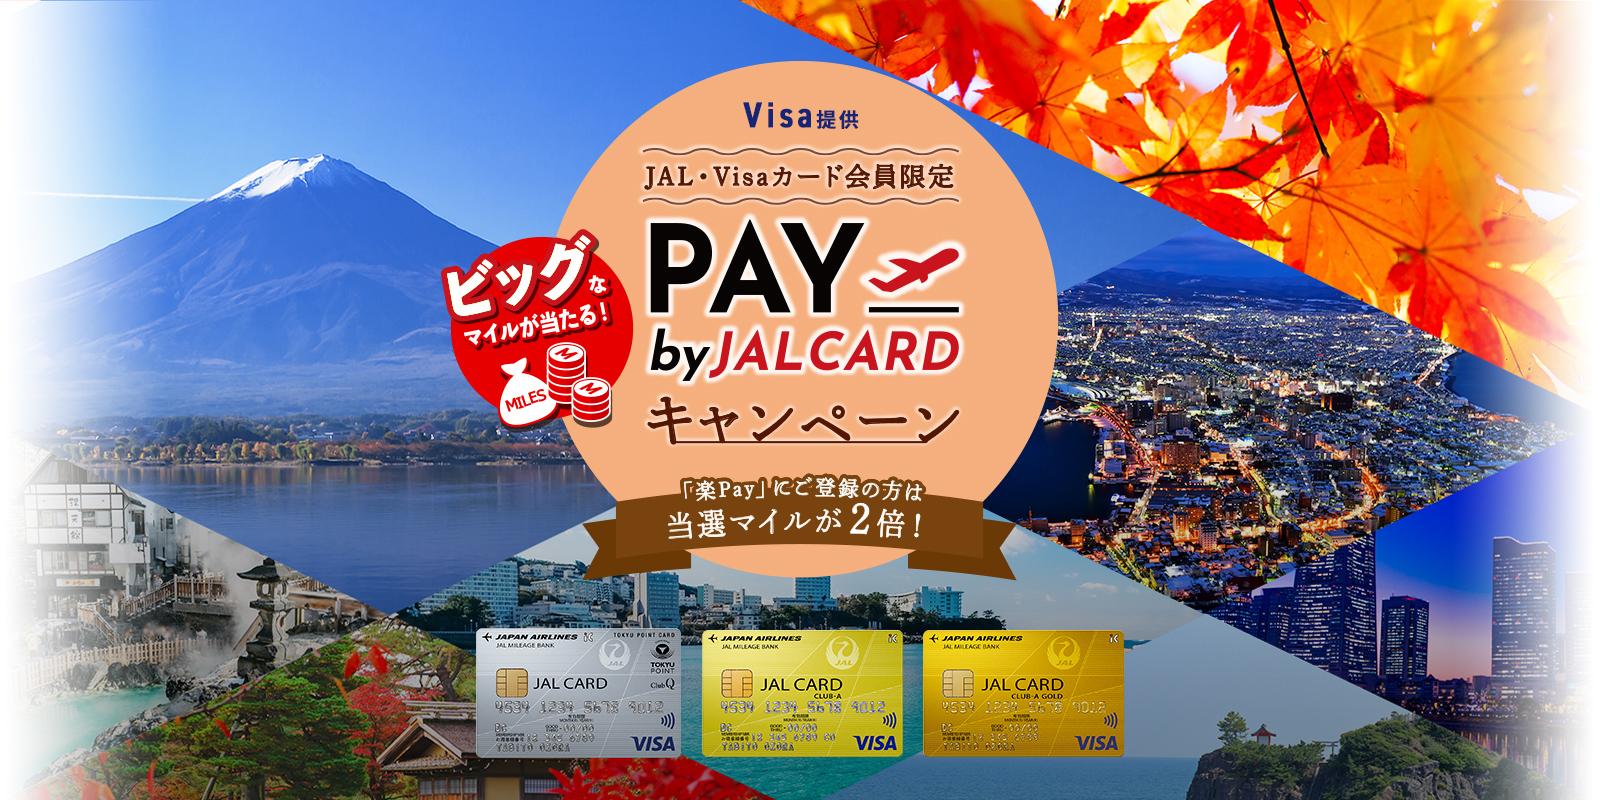 JALカードVisa限定キャンペーン